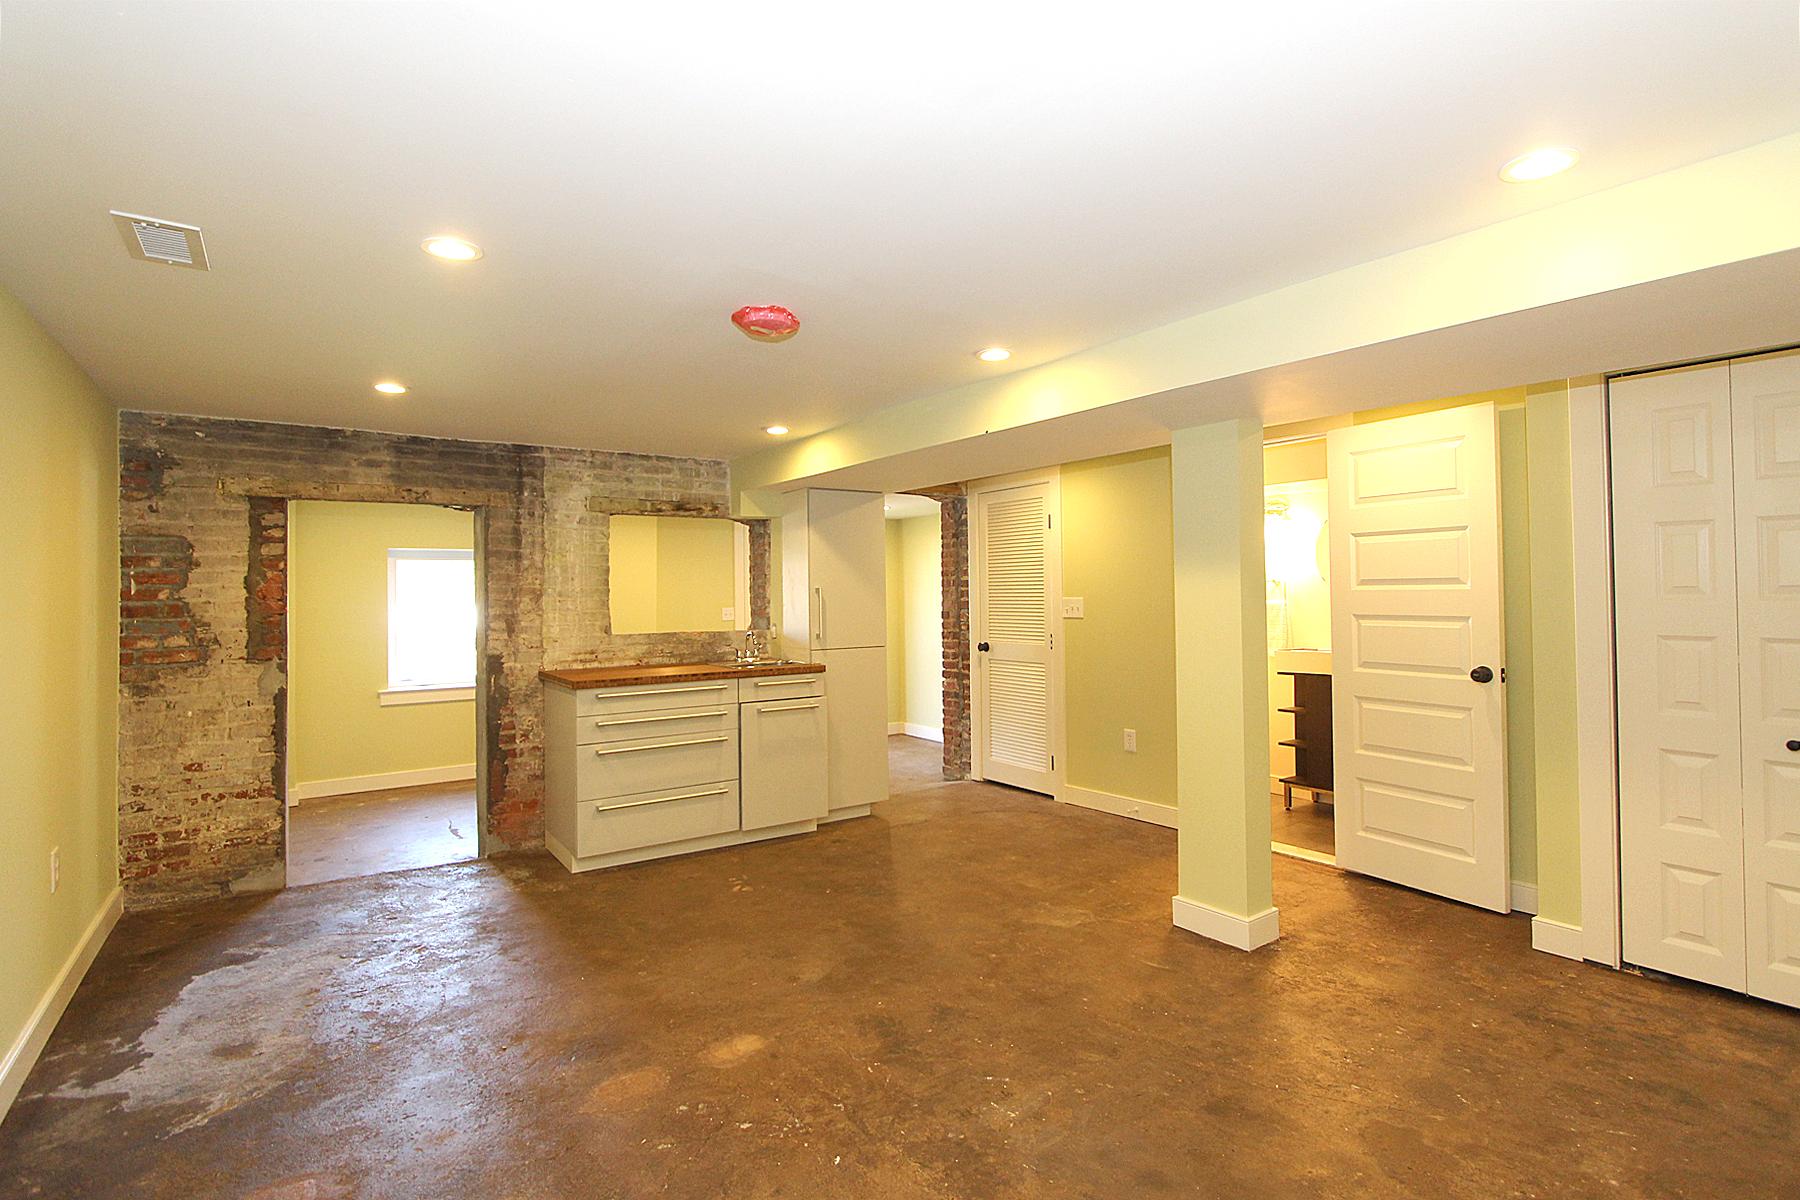 We reuse concrete floors